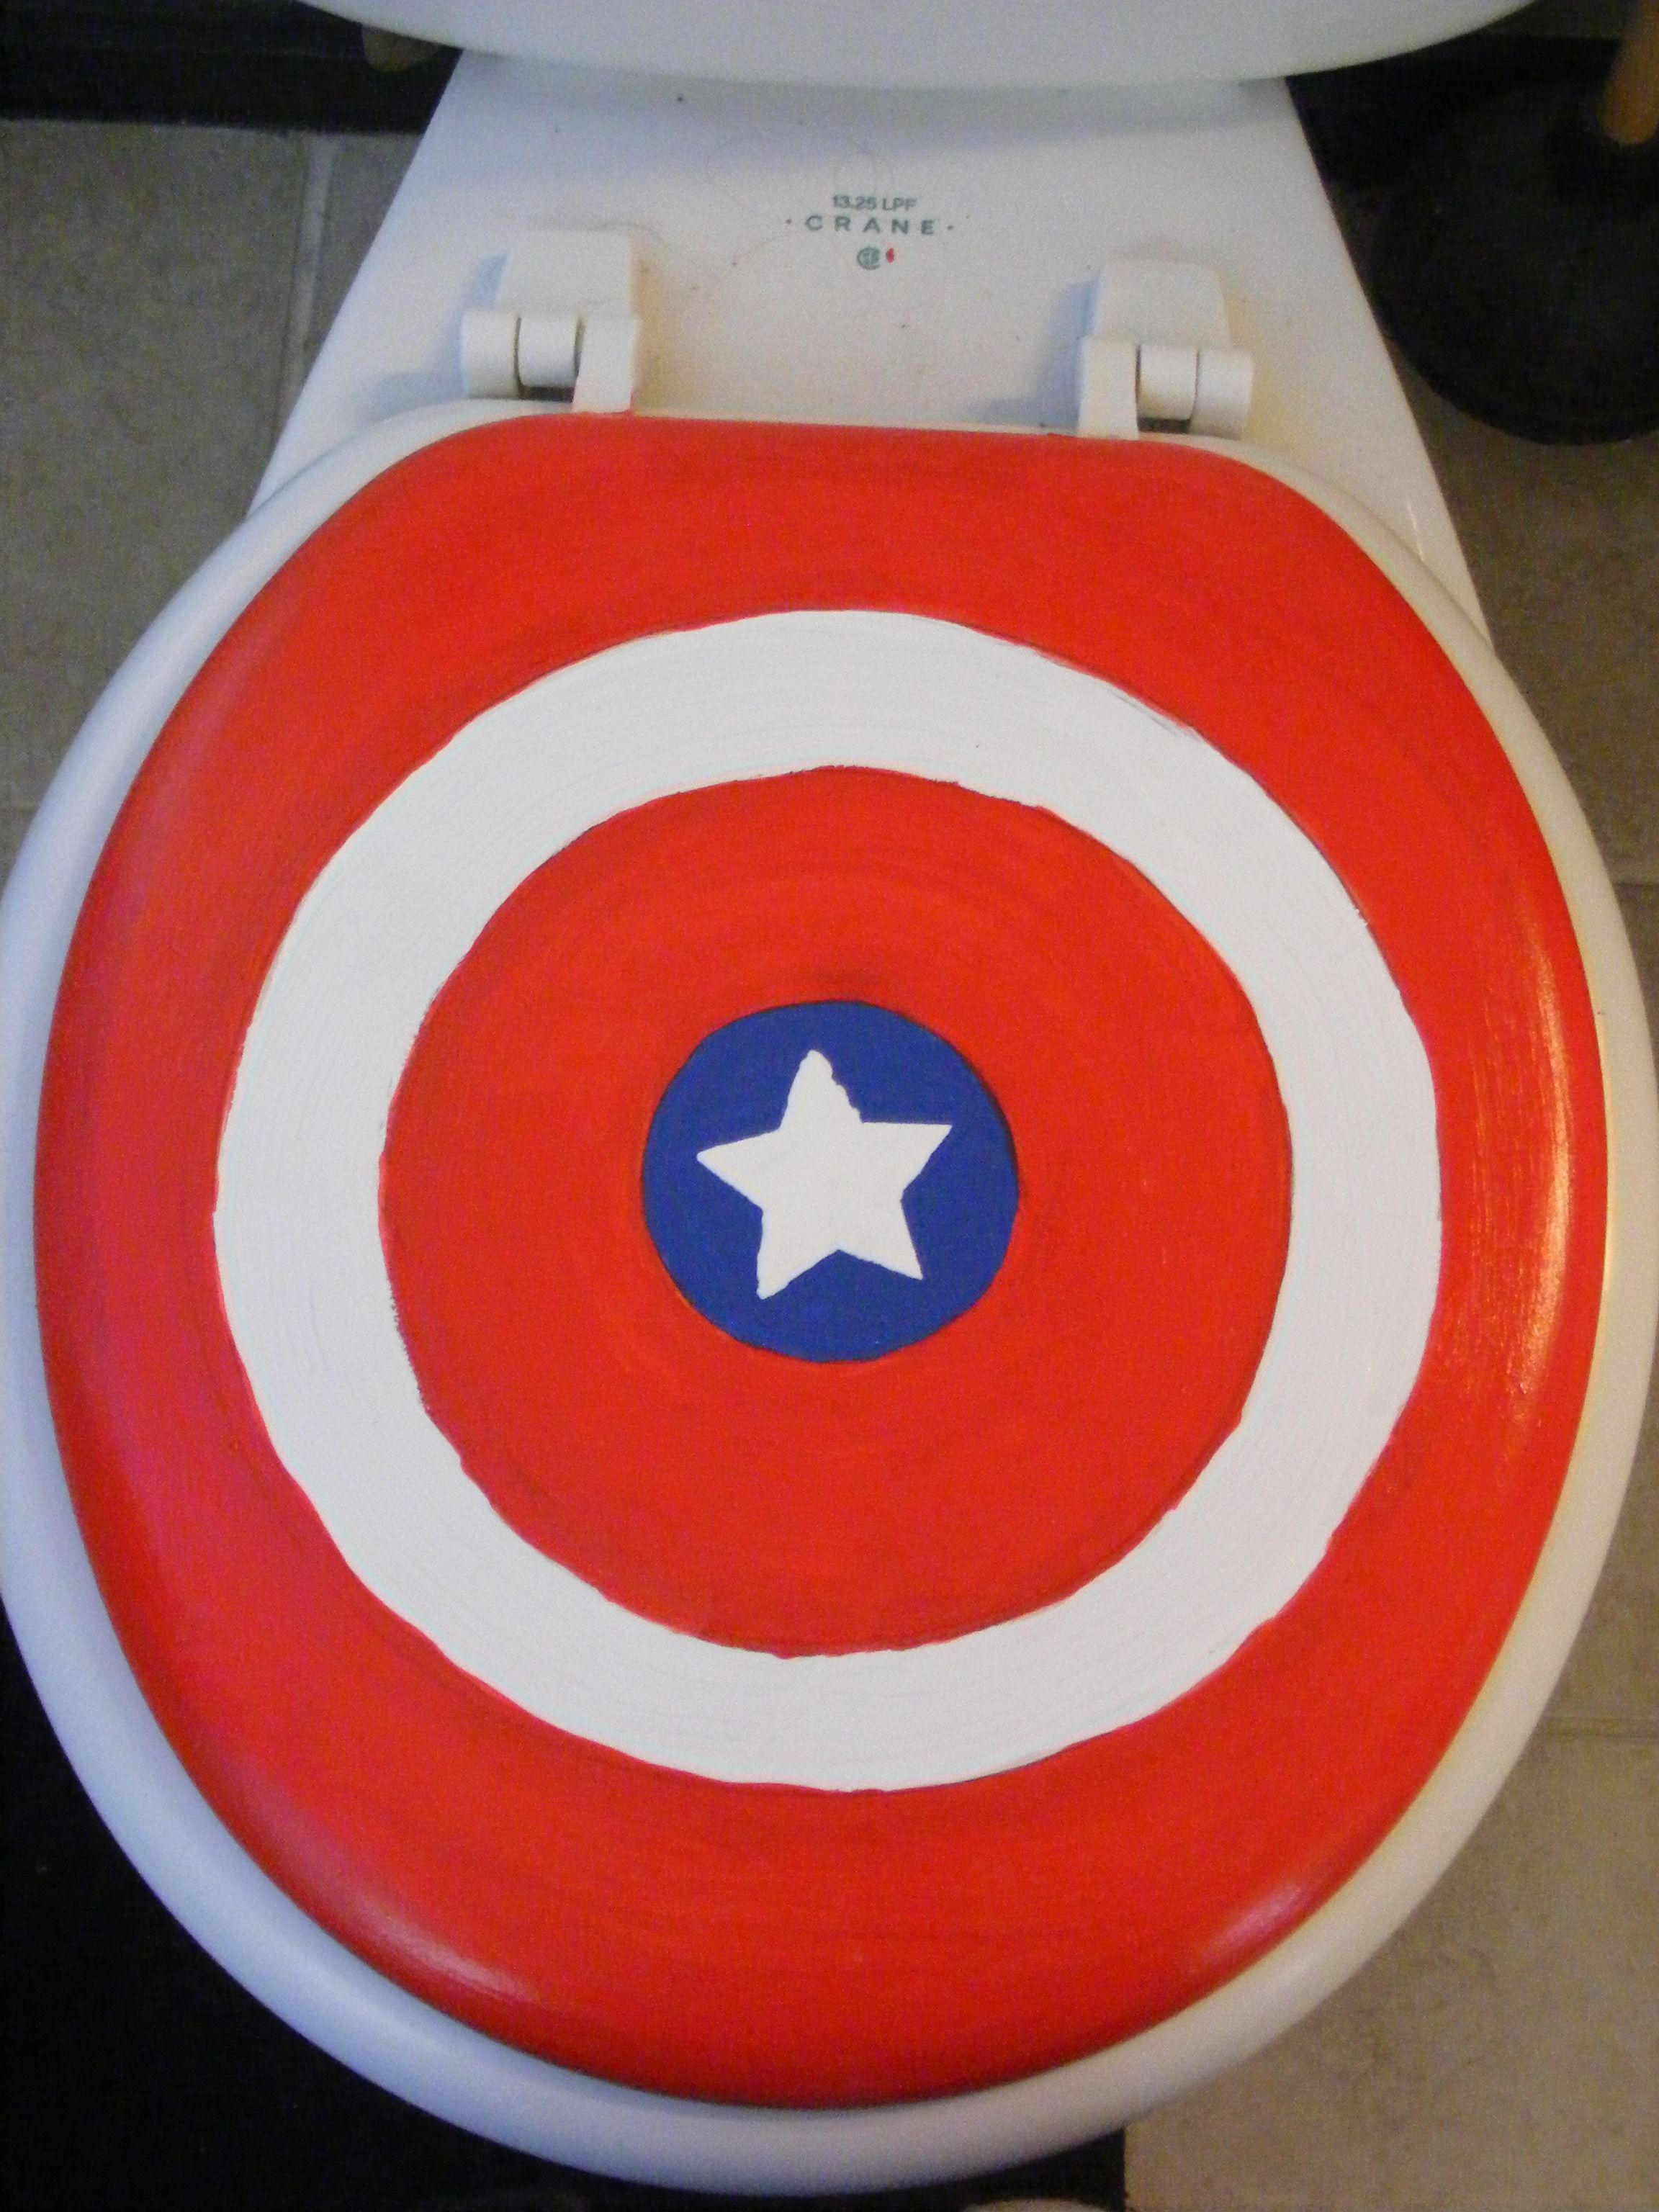 Toilet Seat For Superhero Bathroom Superhero Bathroom Superhero Bathroom Decor Bathroom Kids